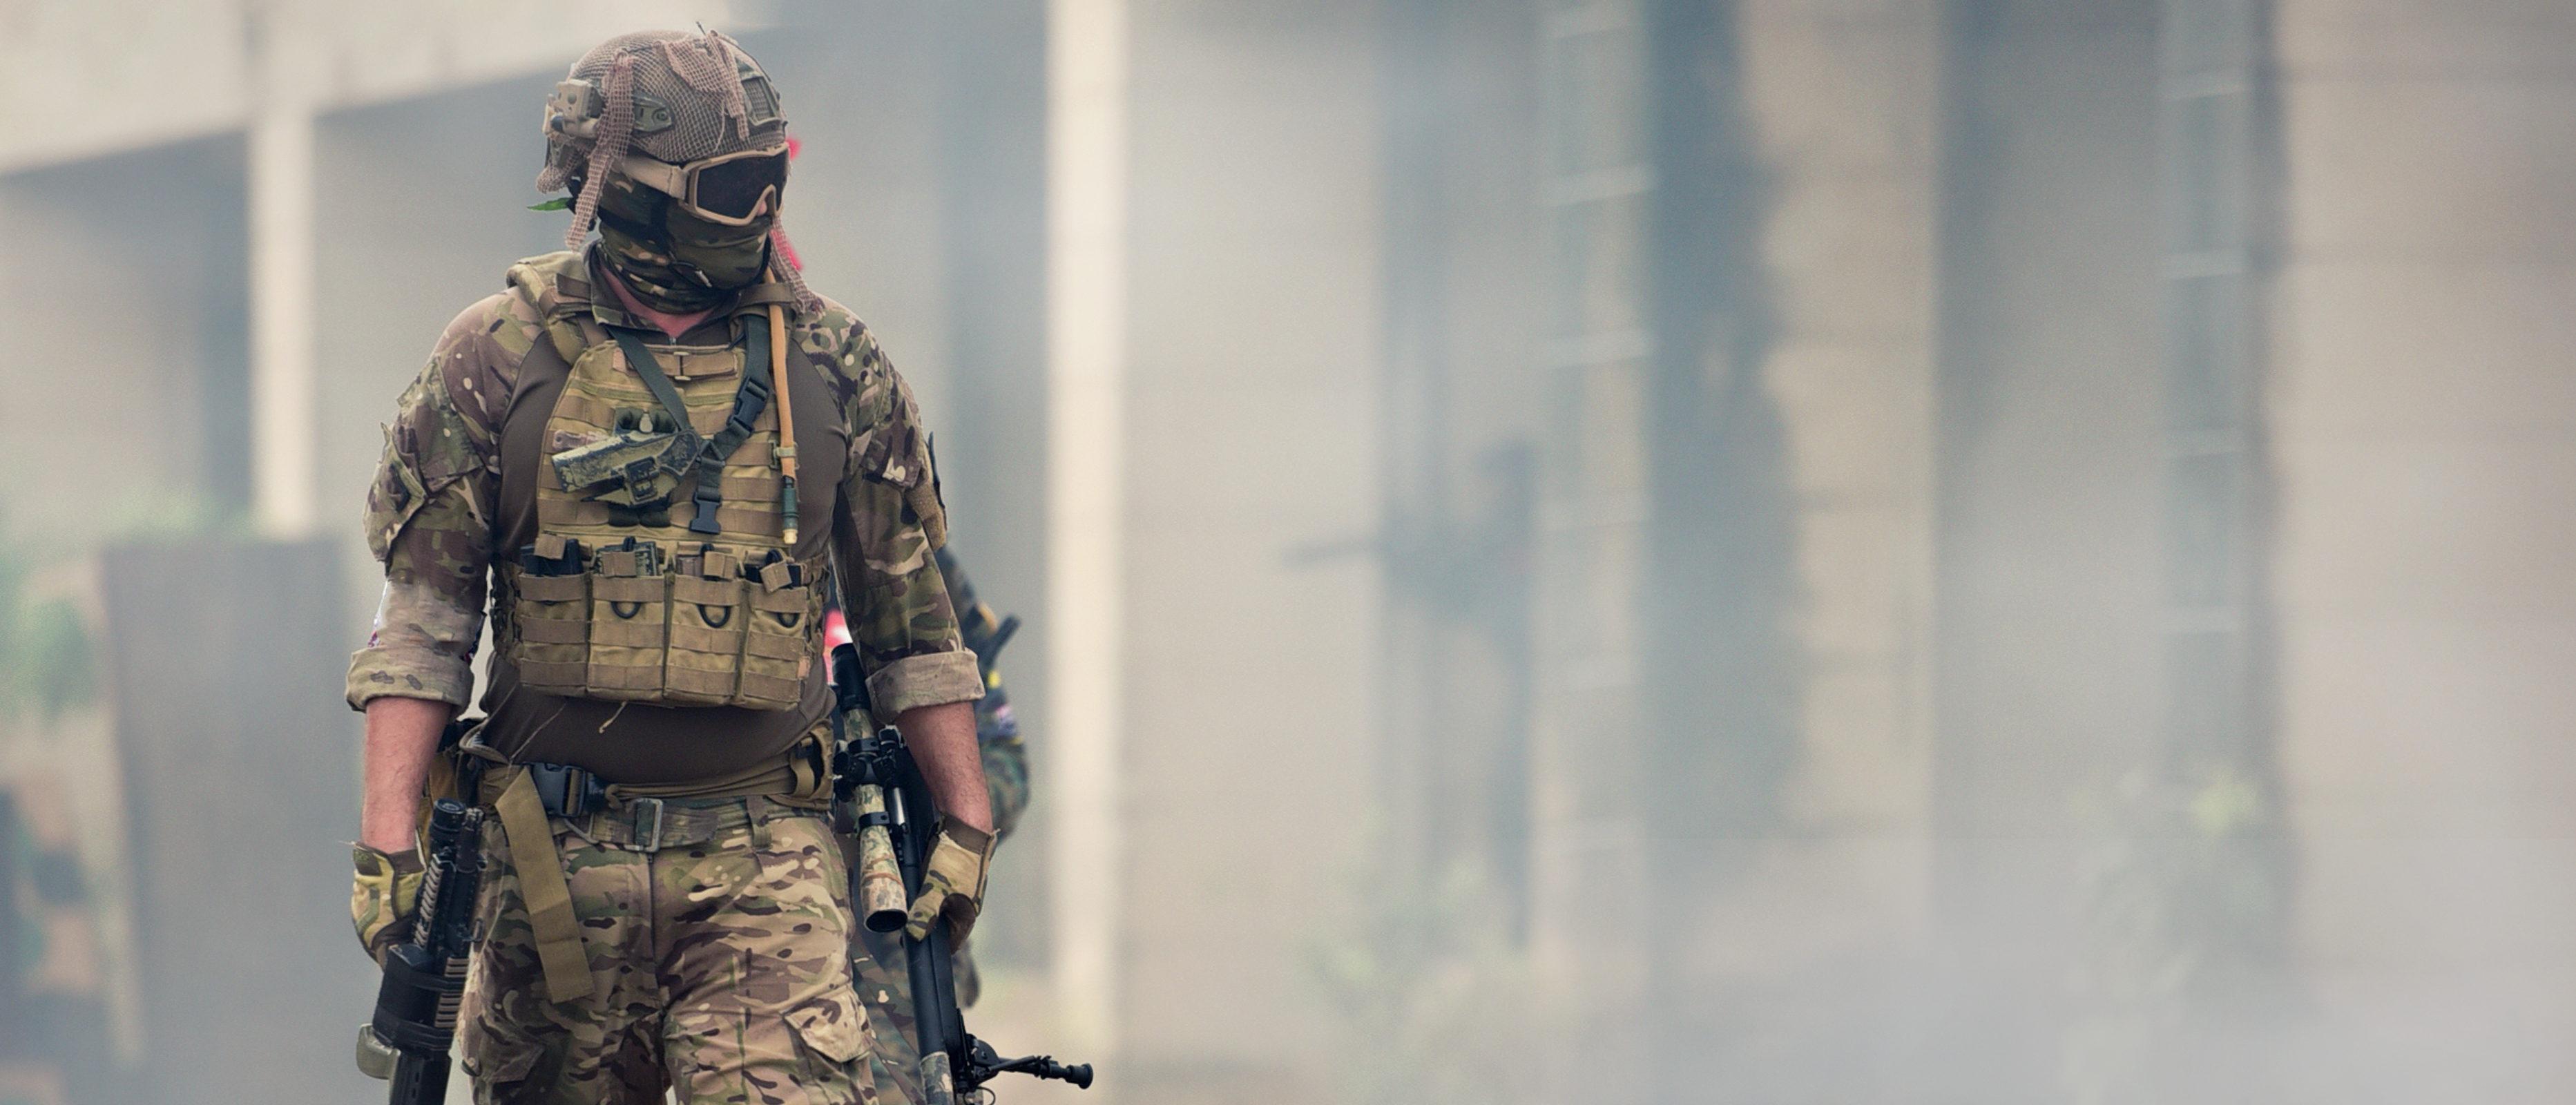 International Criminal Court Won't Investigate Possible War Crimes In Afghanistan